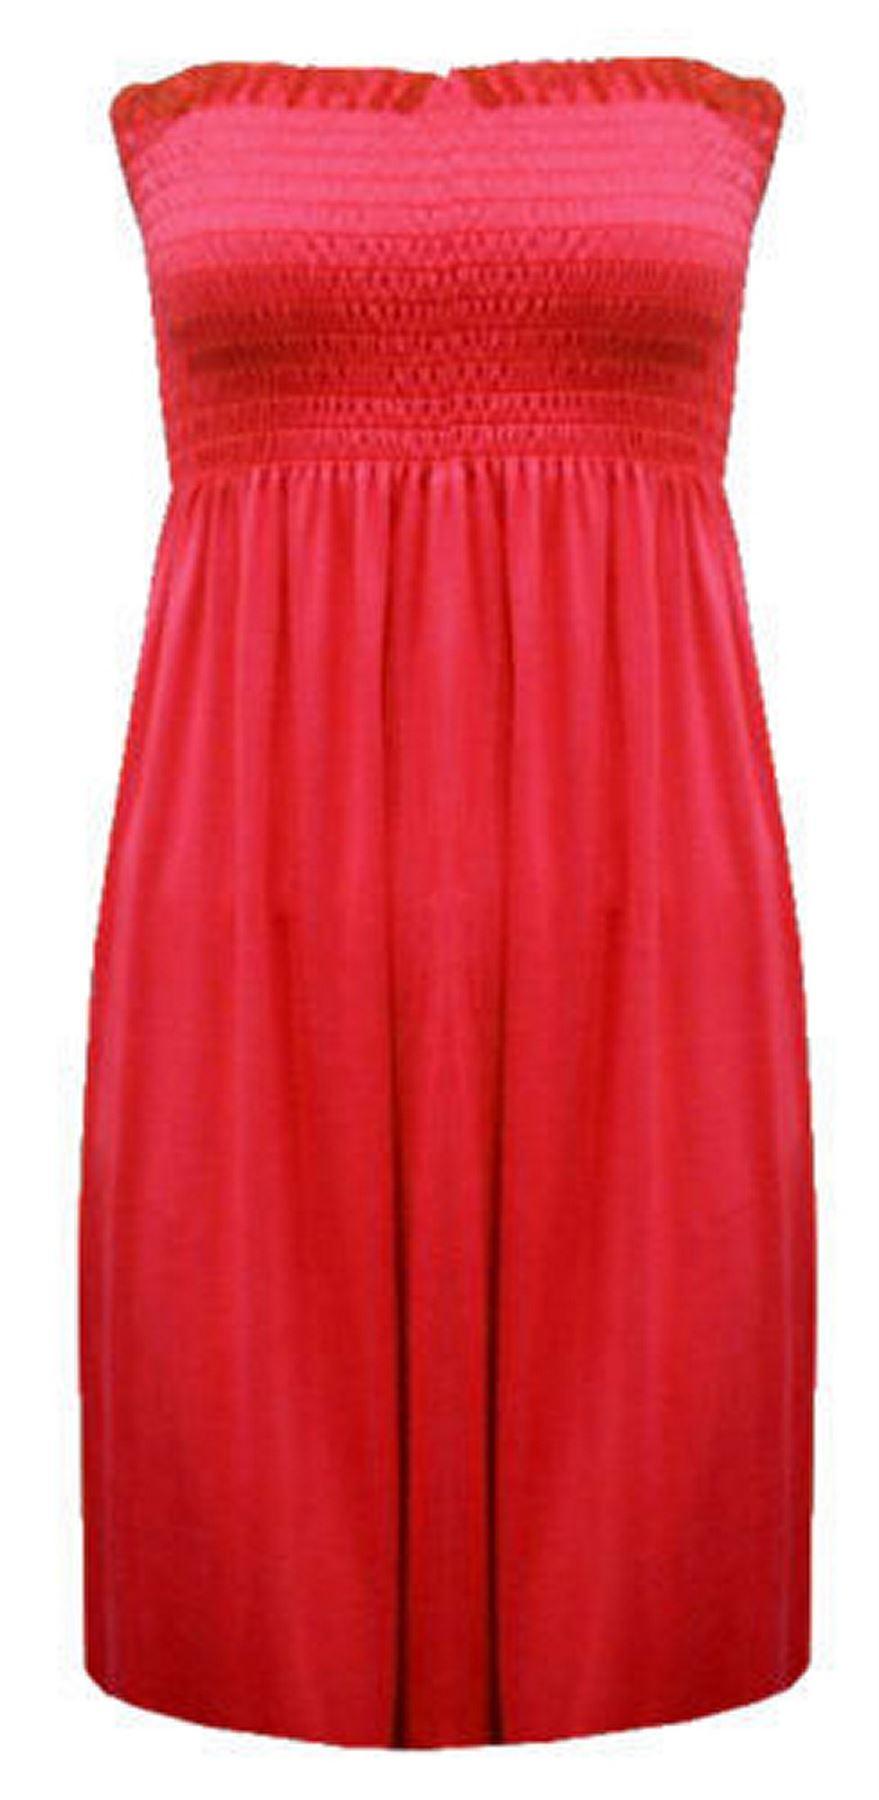 New-Ladies-Bandeau-Boob-Gathering-Tops-Boob-Tube-Beach-Wear-Tunics-8-26 thumbnail 61